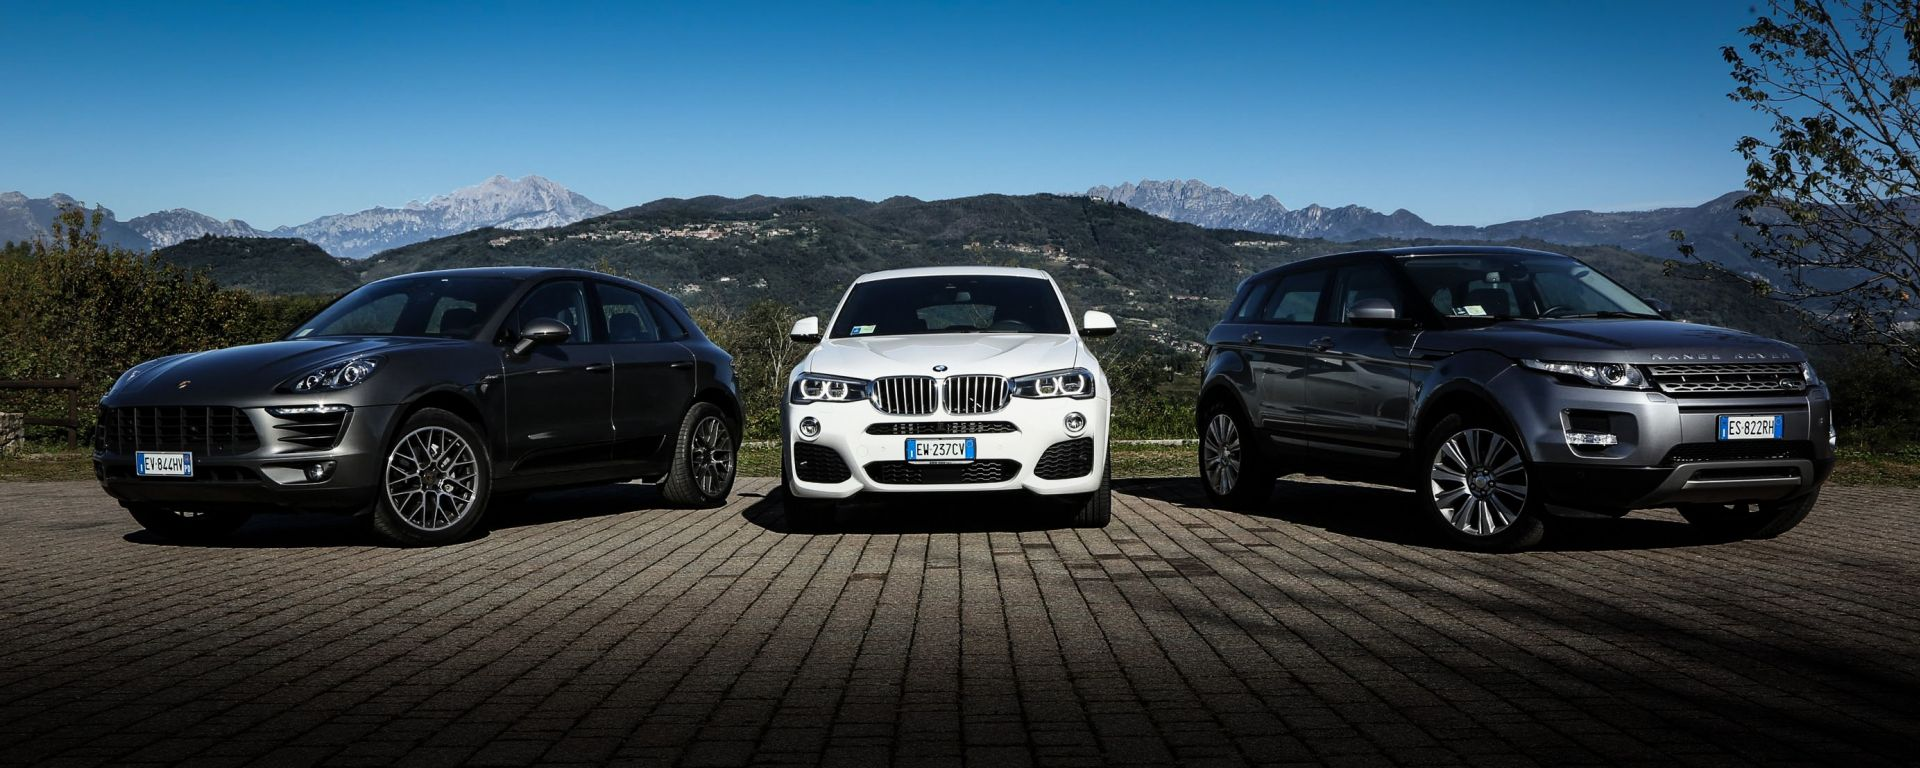 Porsche Macan vs BMW X4 vs Range Rover Evoque